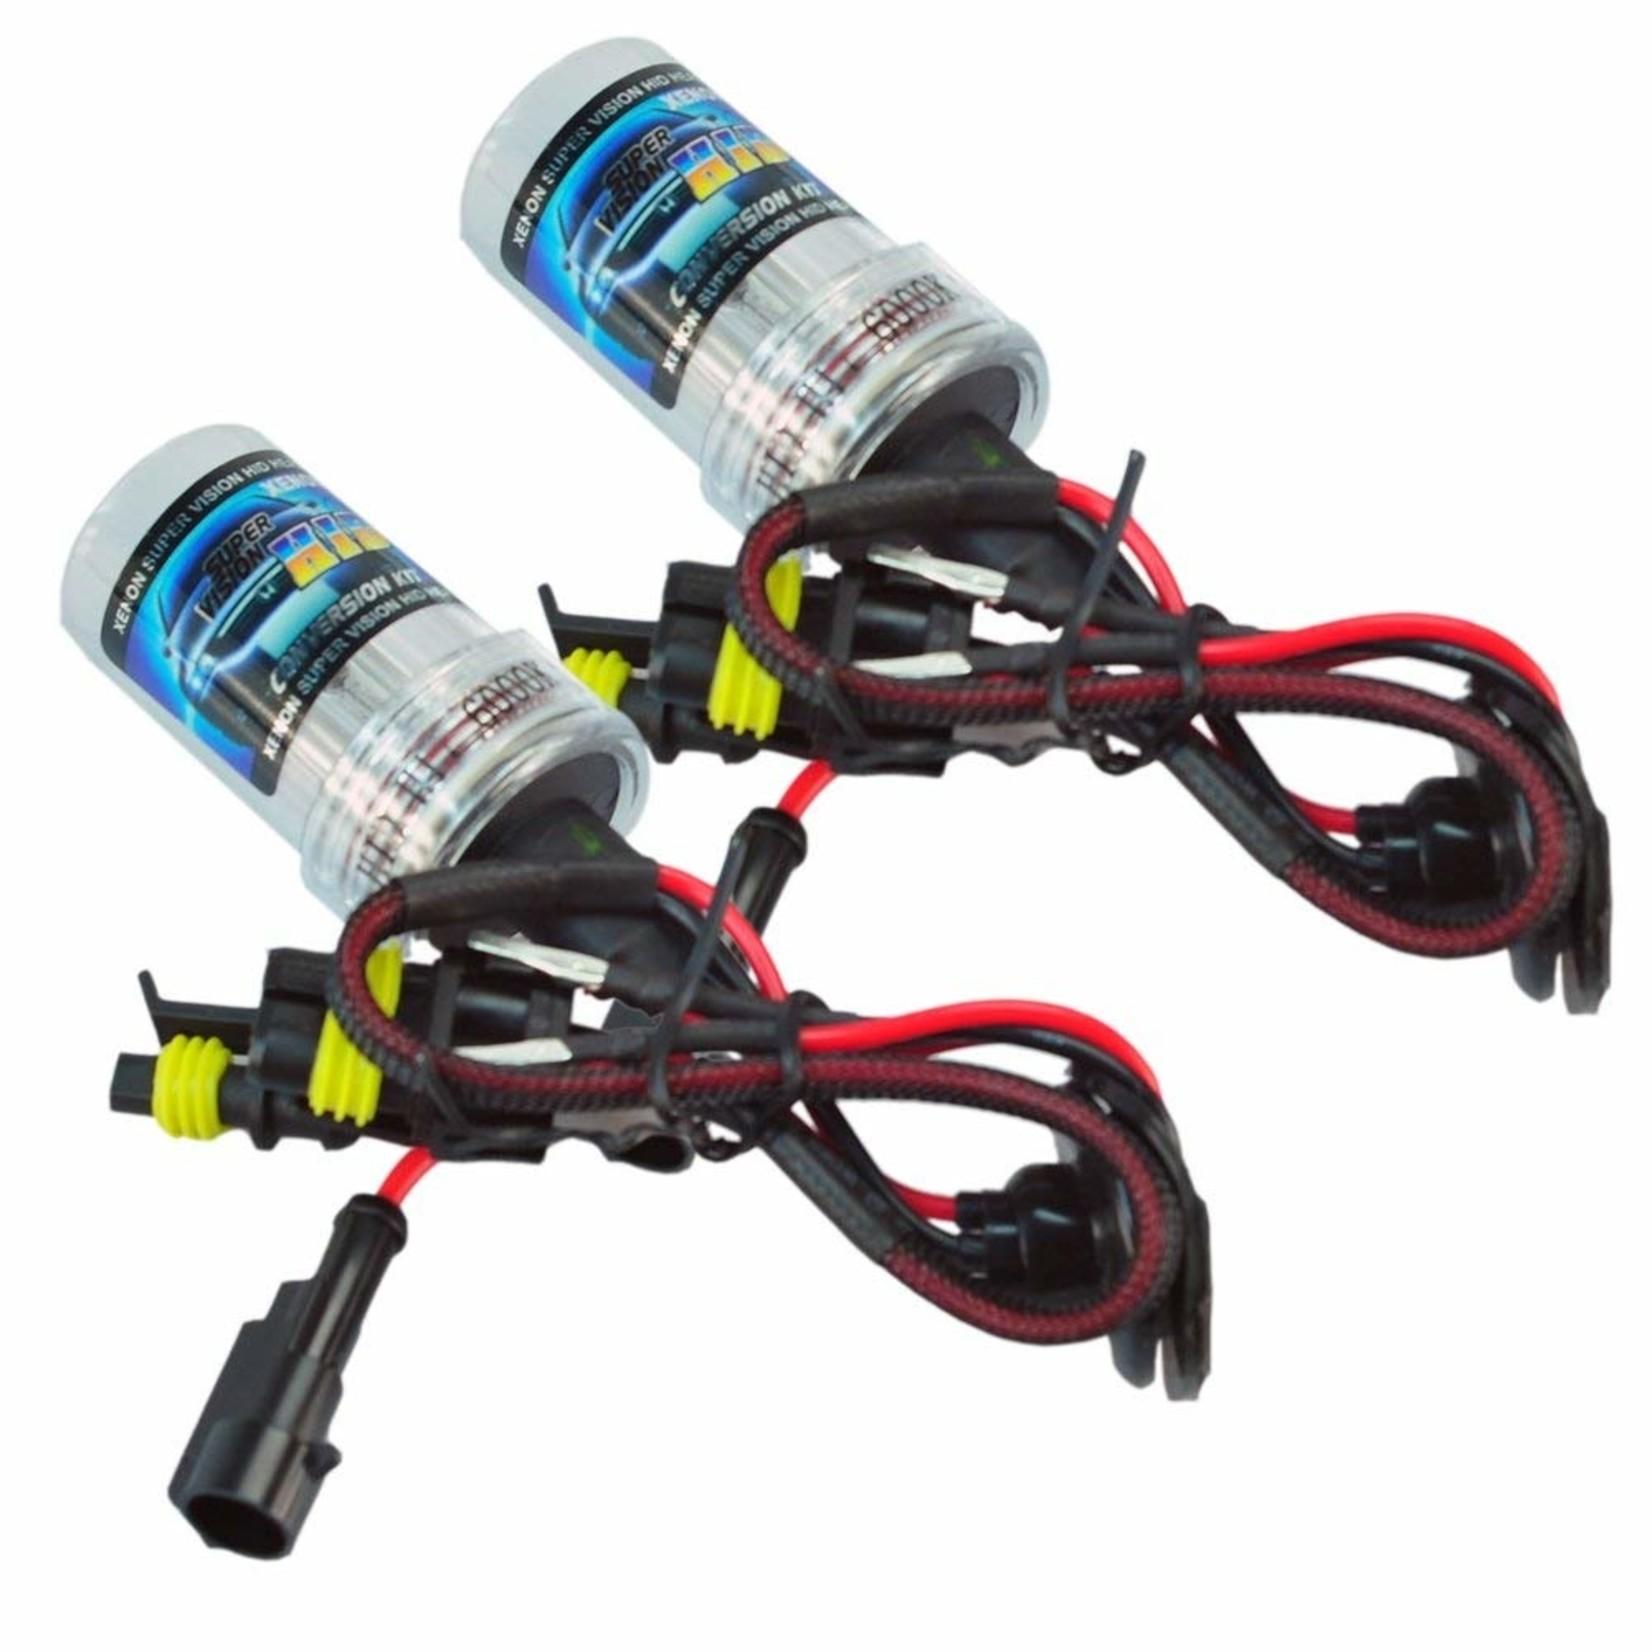 XEOD HB3/9005 Xenon vervangingslamp